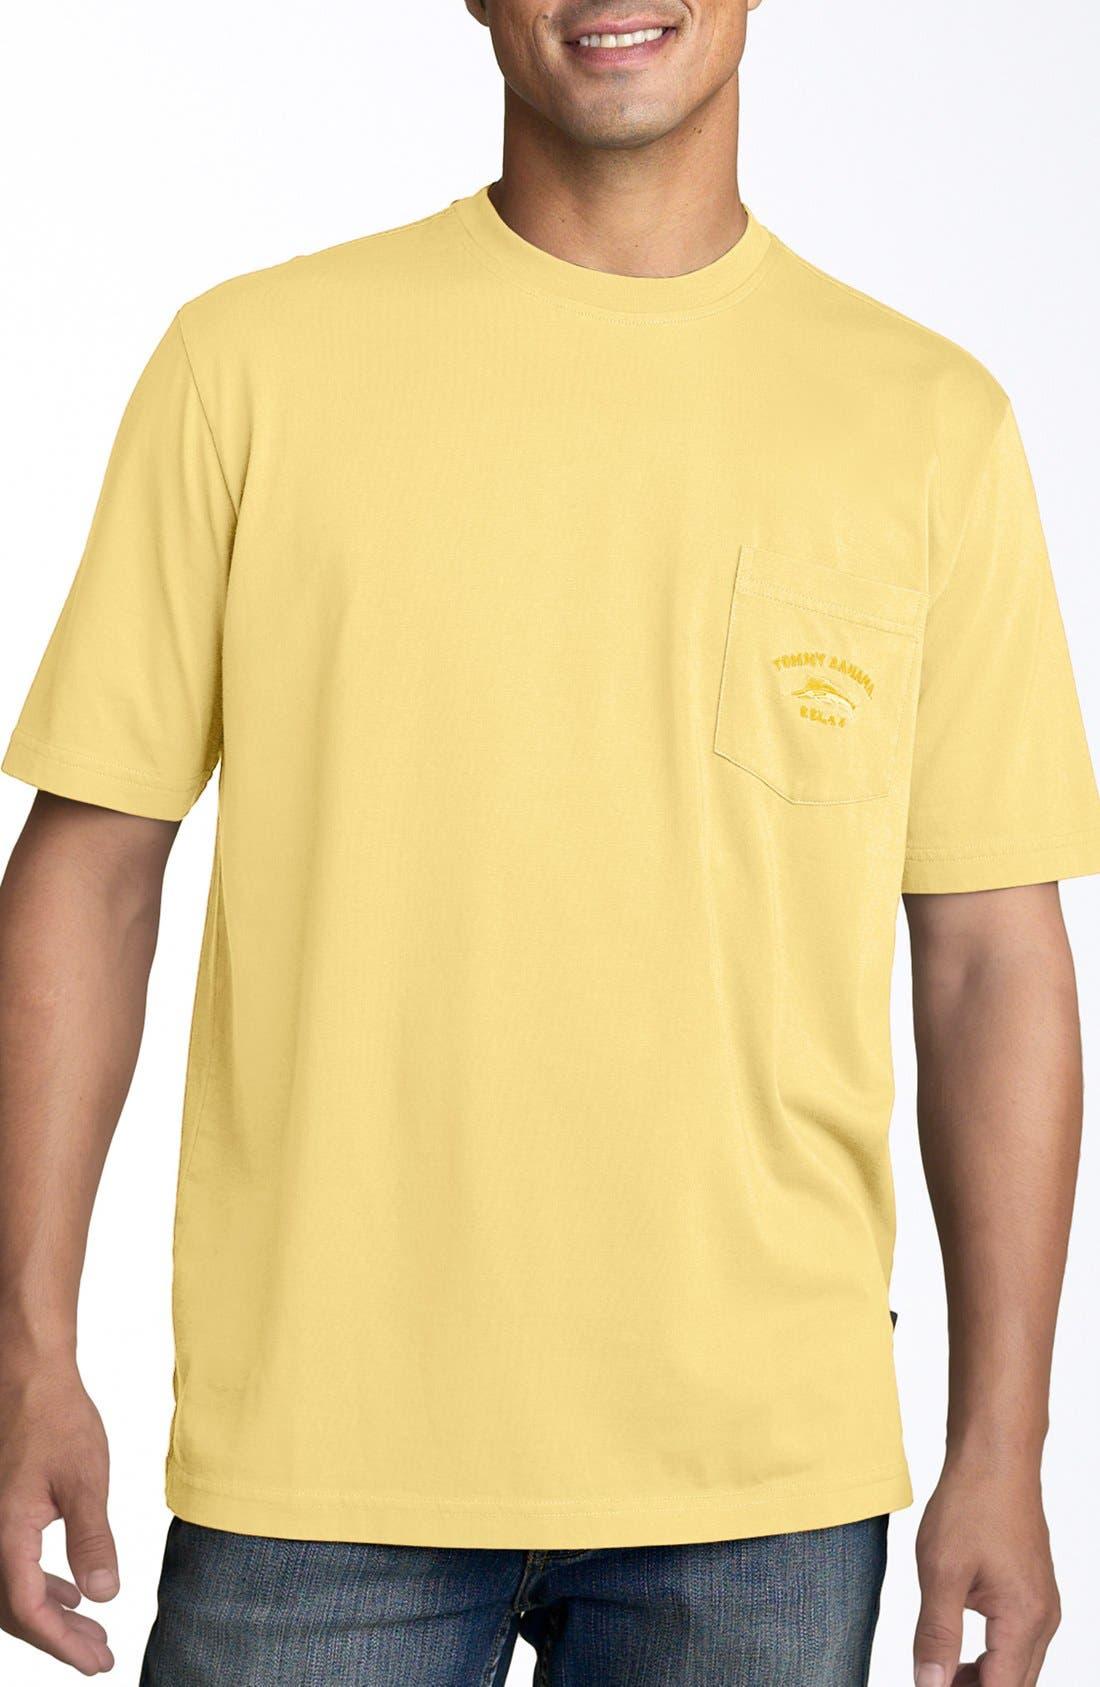 Main Image - Tommy Bahama Relax 'Bali High Tide' Regular Fit T-Shirt (Big & Tall)